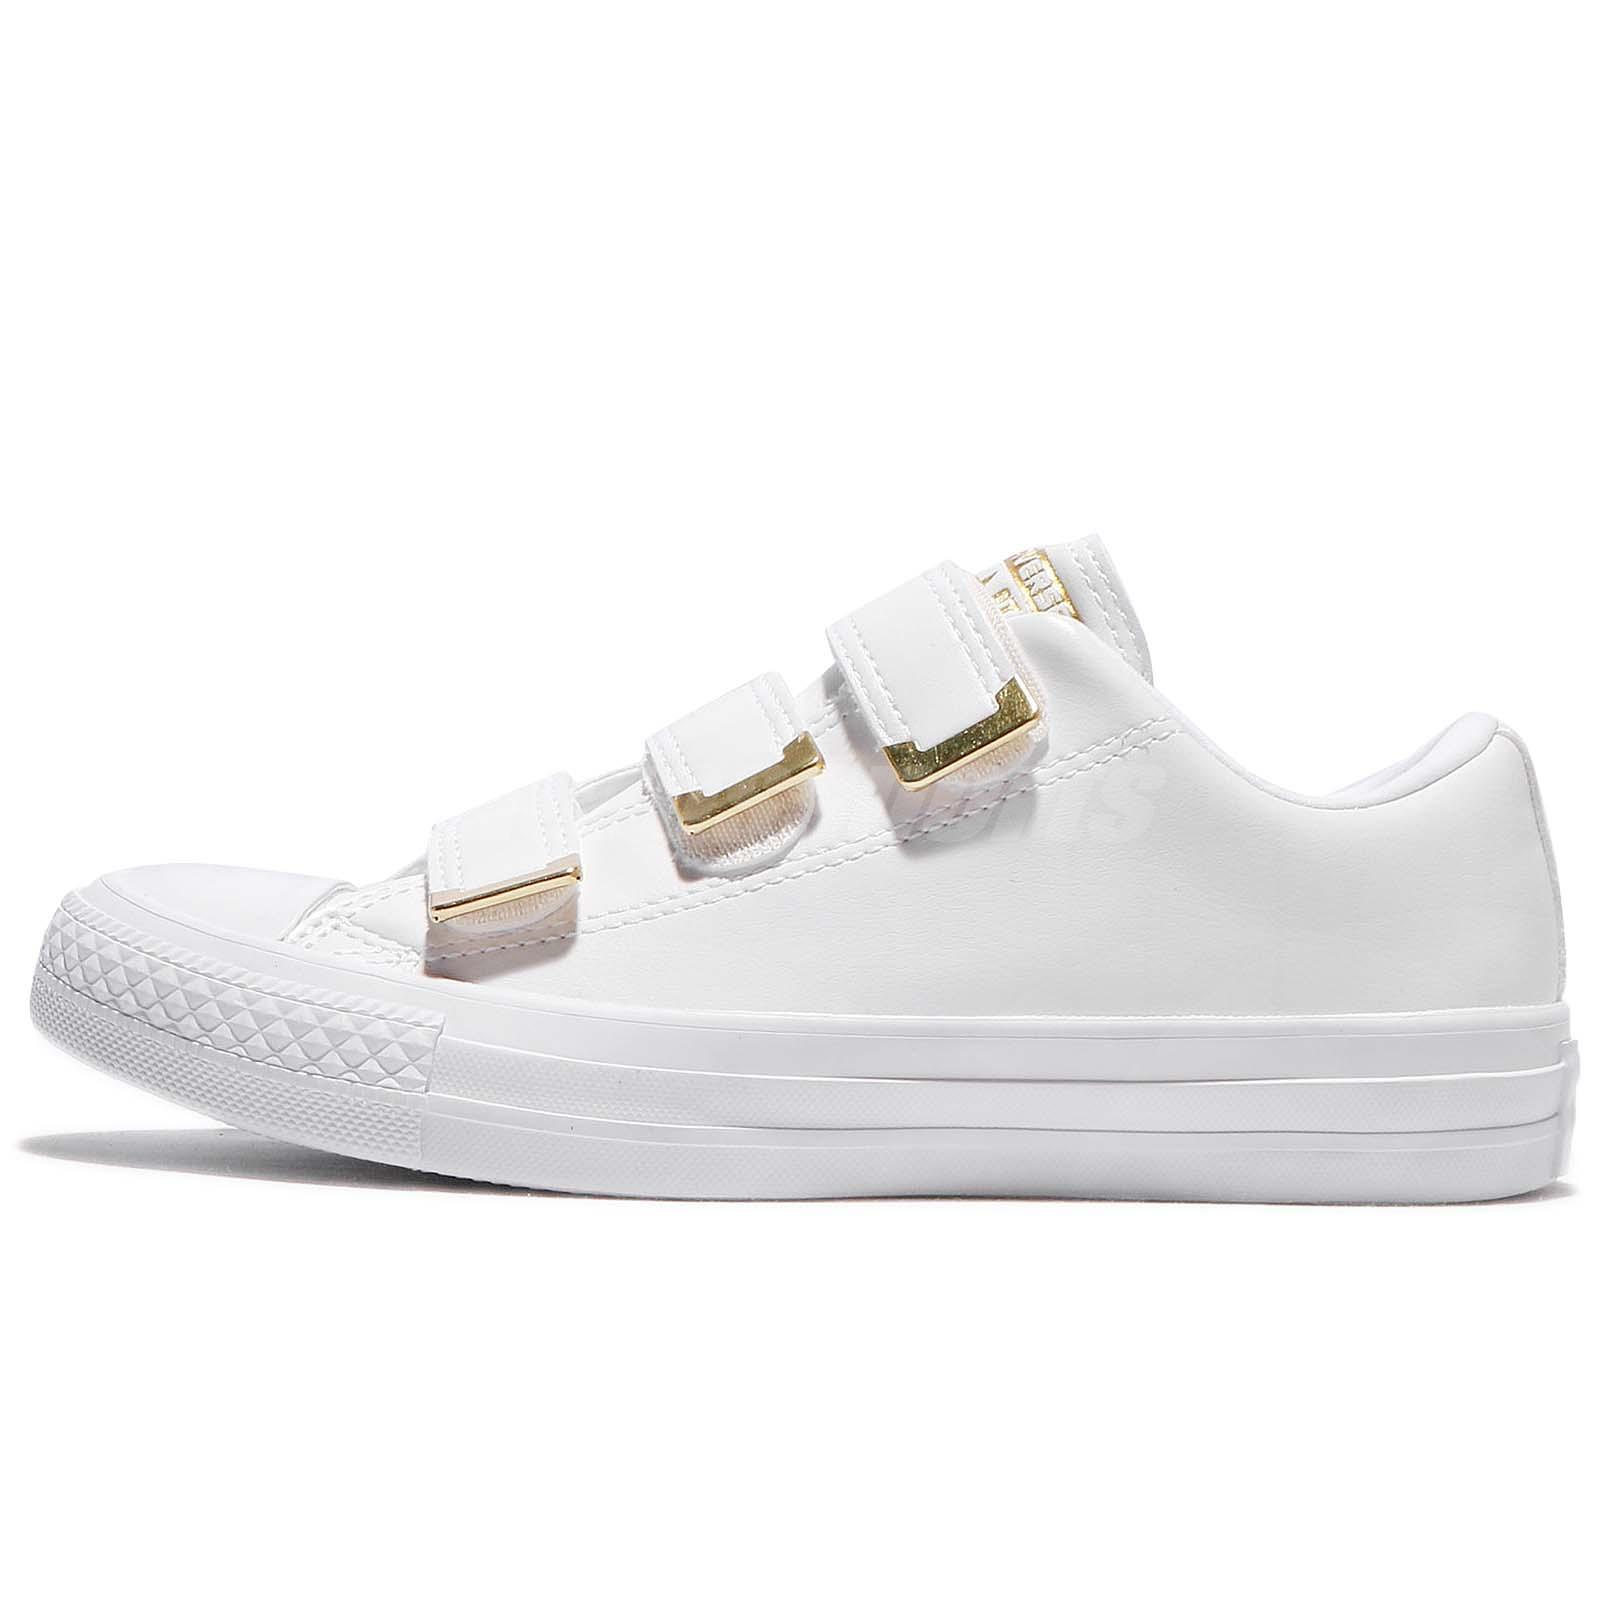 Converse chuck taylor all star 3v strap white gold women shoes converse chuck taylor all star 3v strap white gold women shoes sneakers 559905c geenschuldenfo Choice Image